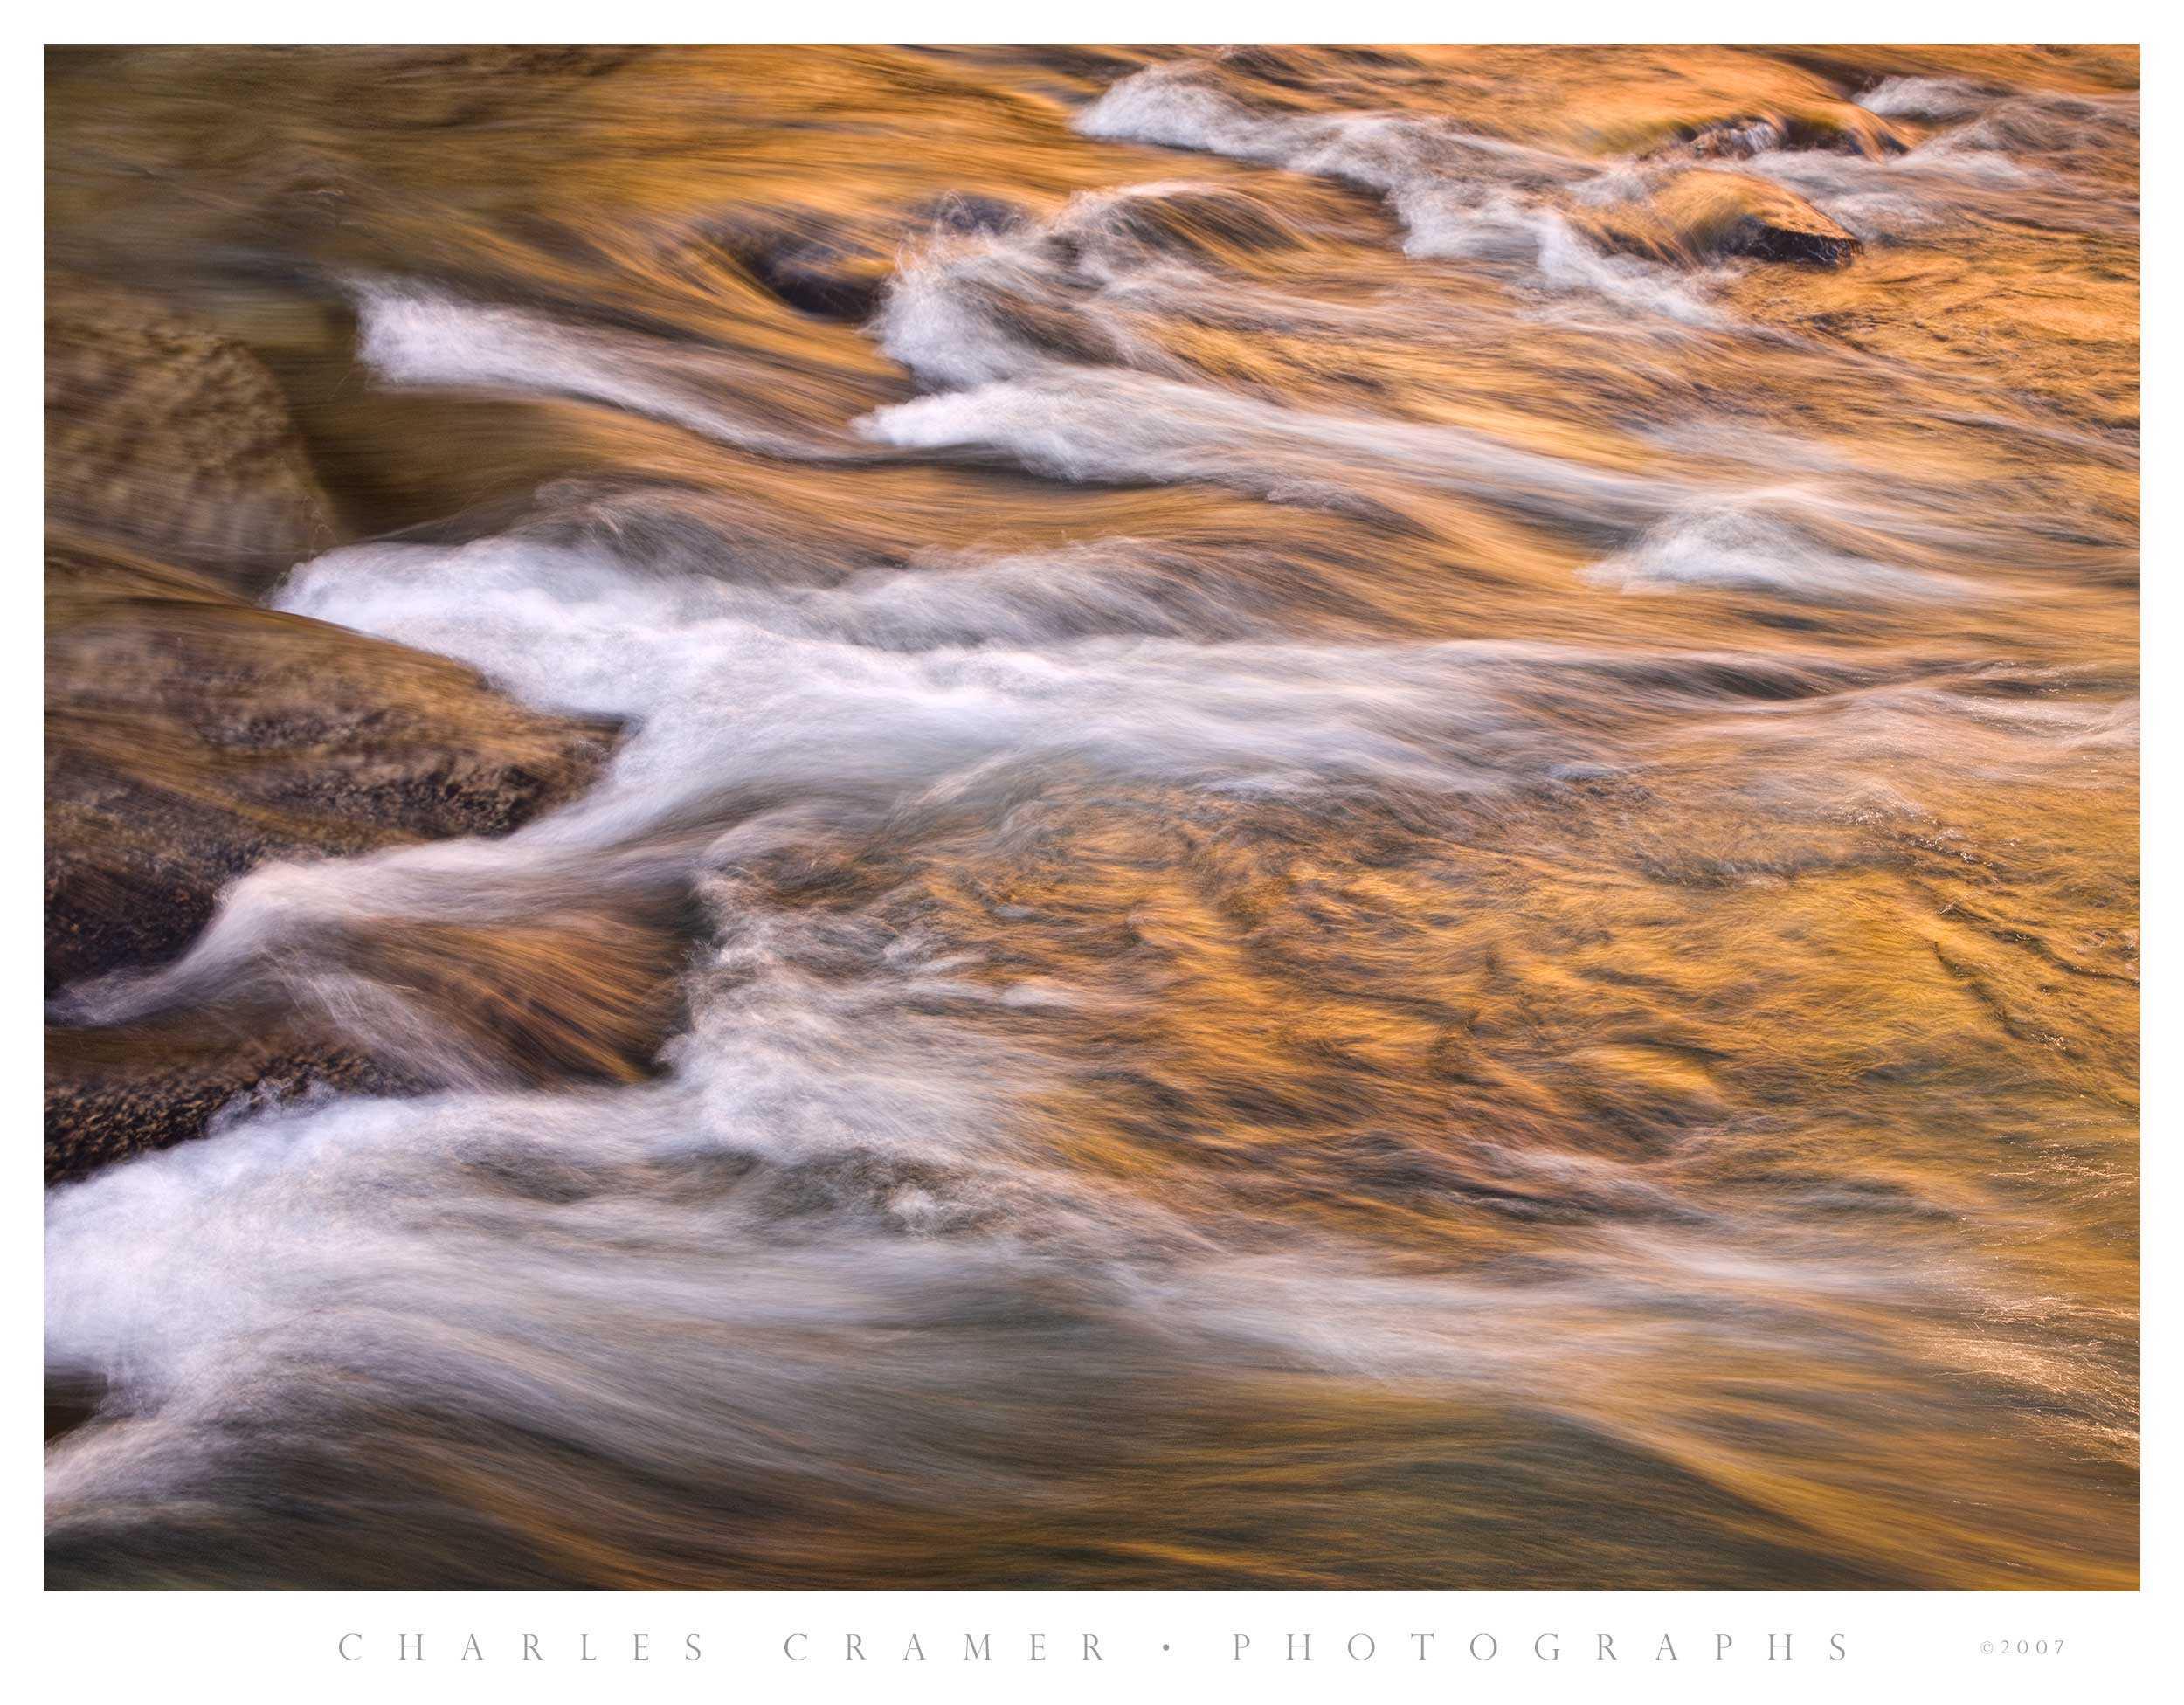 Morning Reflections, Tuolumne River, Yosemite